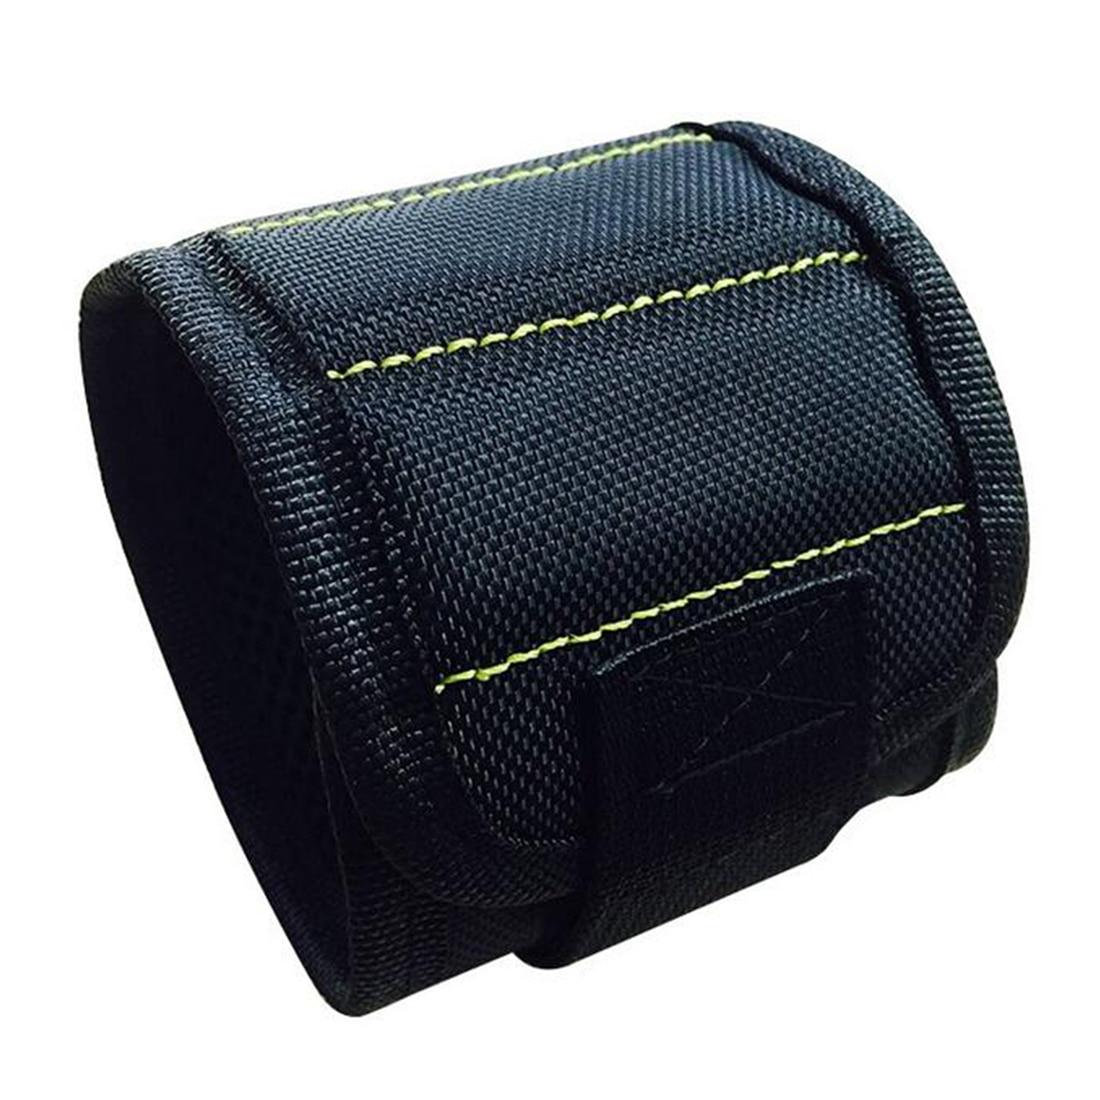 Holder Wristband Holding Hand Tool Bag Bracelet Belt 370mm Nylon Wrist Strong Magnetic Nail Screw Drill Bit Car Auto Repair Kit